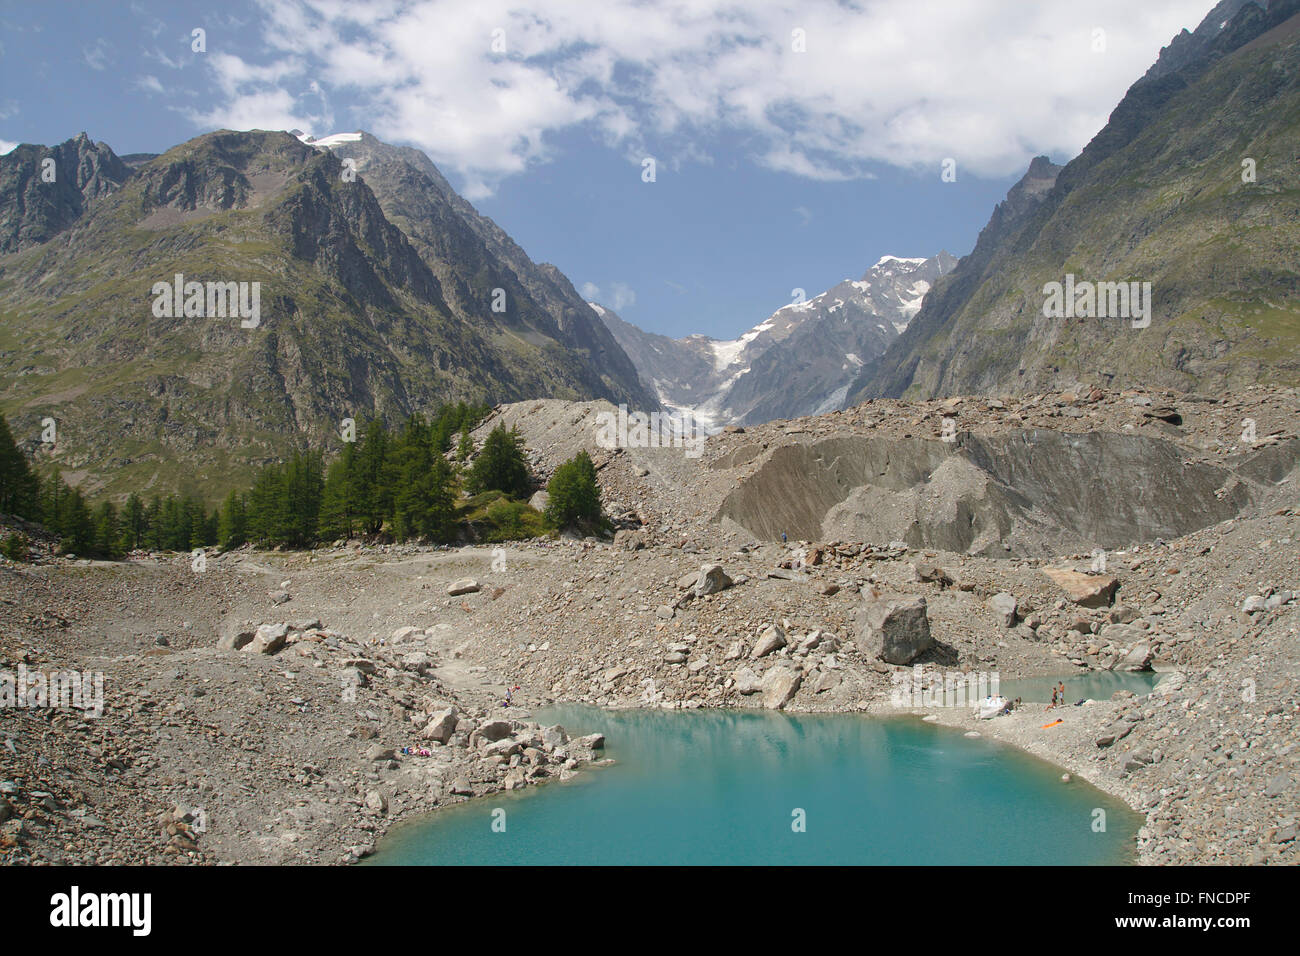 Lac du Miage and Glacier du Miage, Val Veny, Mont Blanc Massif, Italy - Stock Image